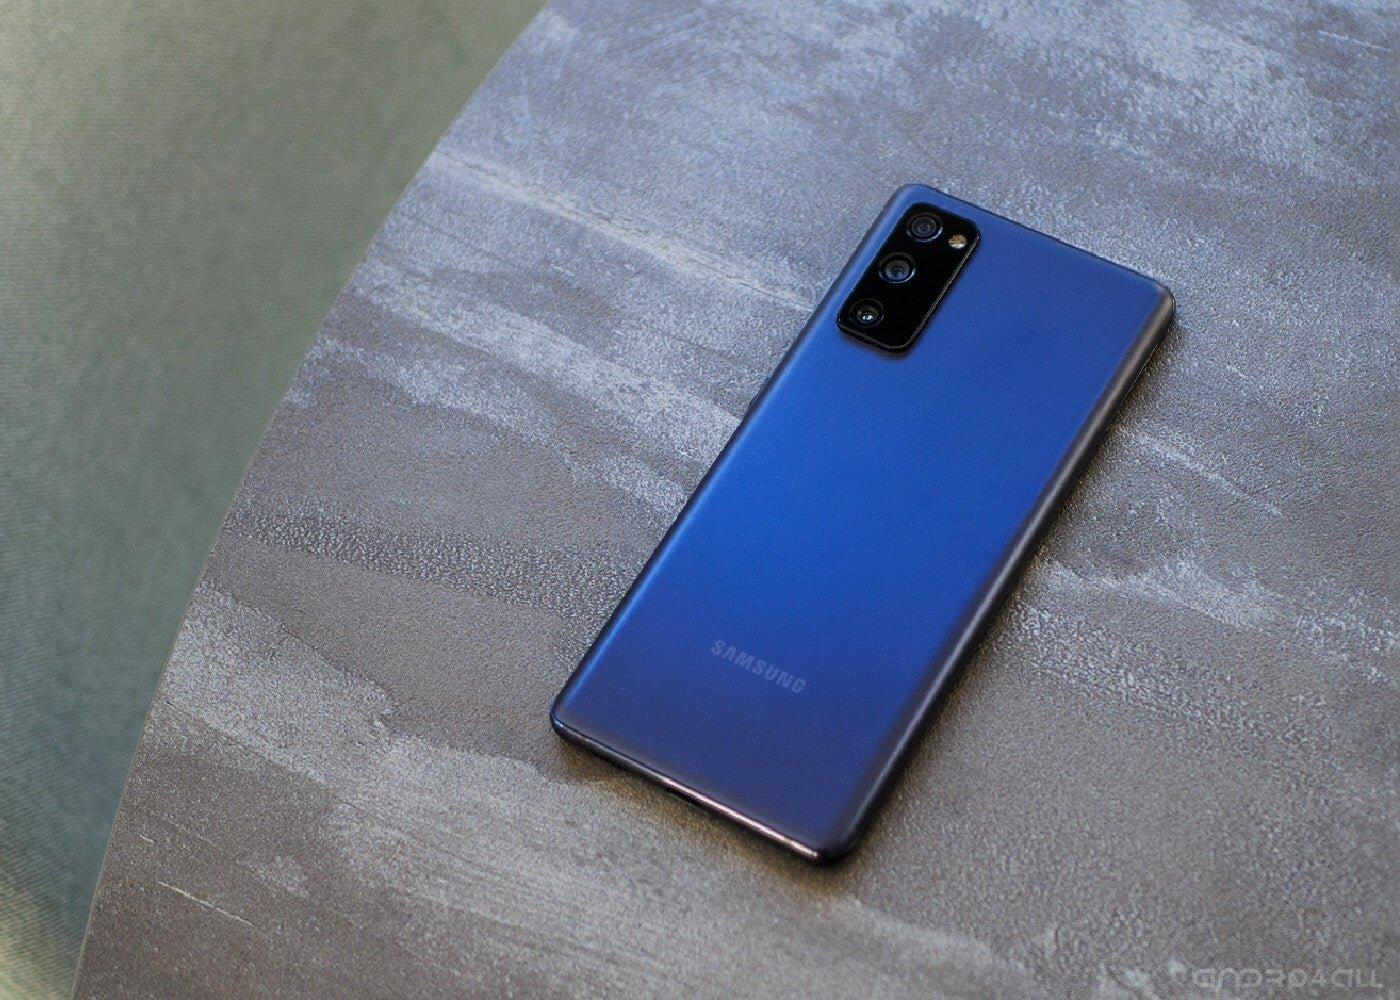 Samsung Galaxy S20 FE, de retour de couleur bleu marine